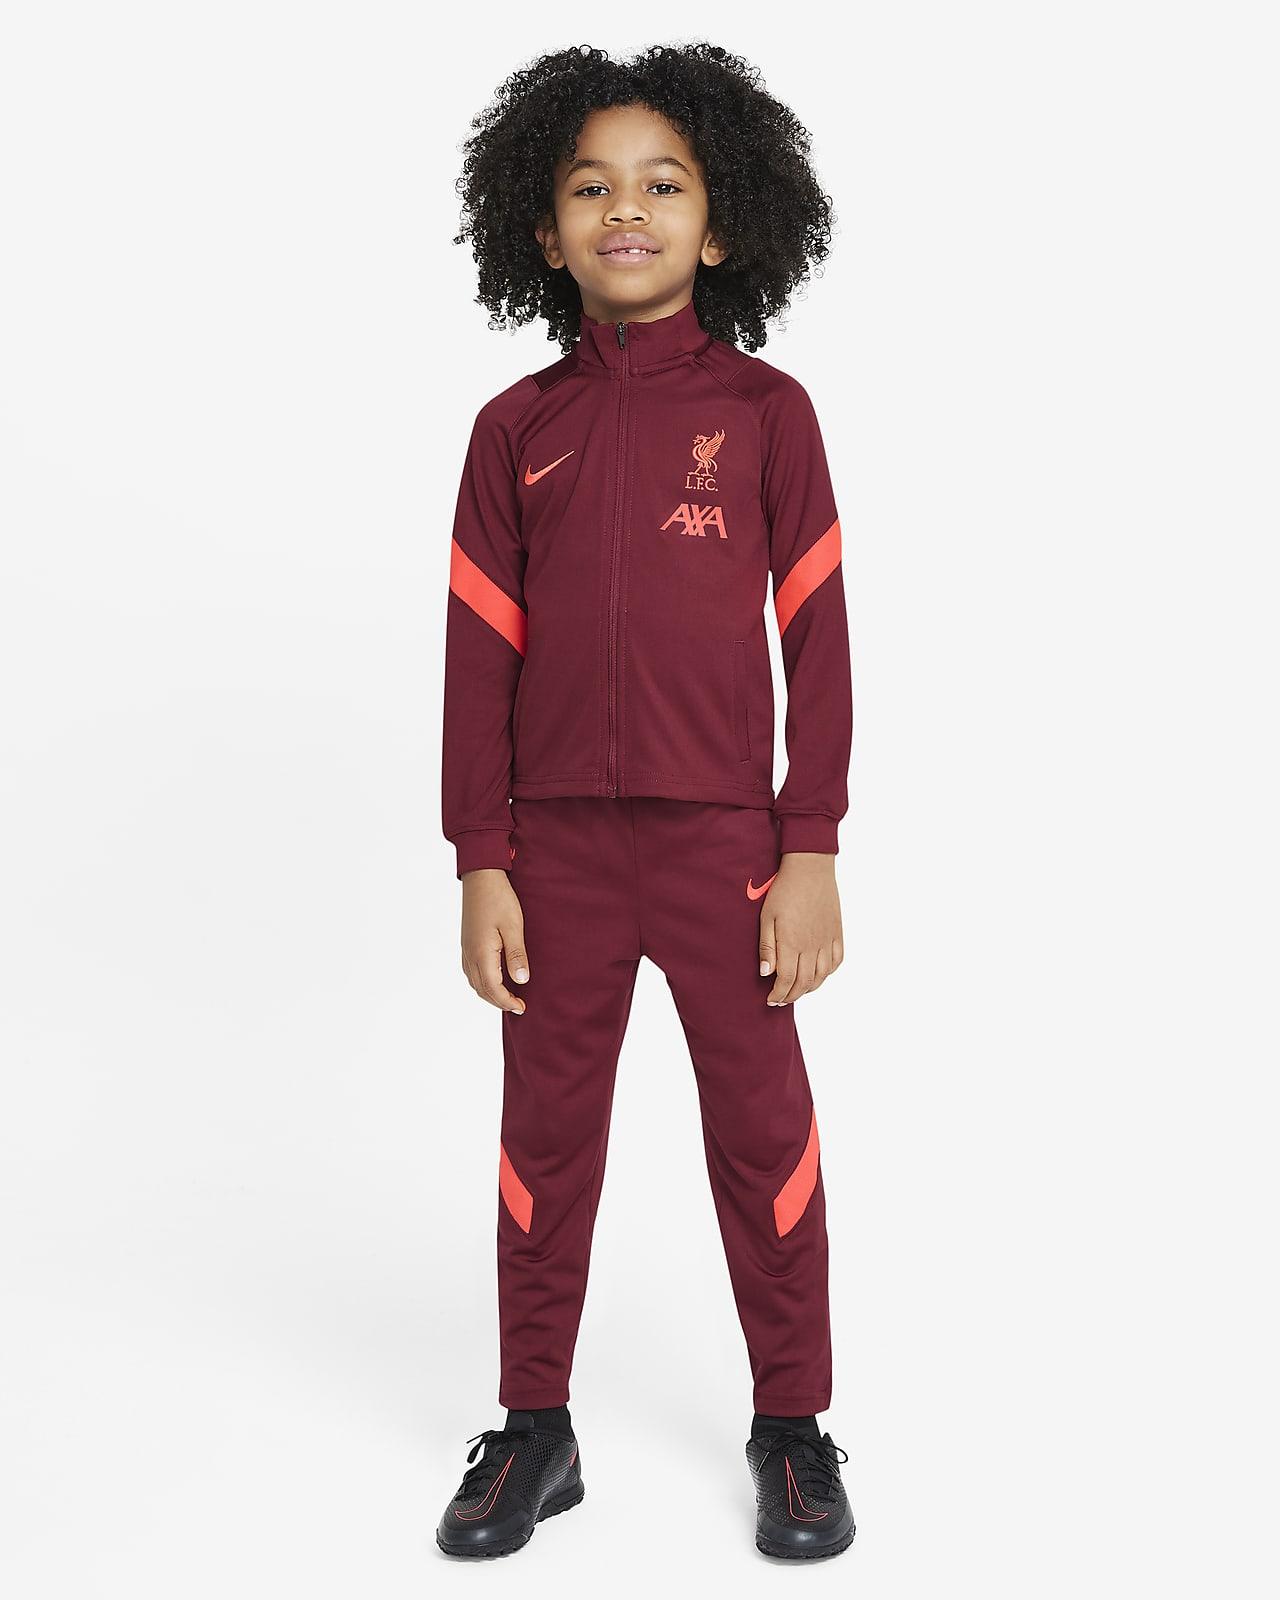 Liverpool FC Strike Xandall de futbol - Nen/a petit/a